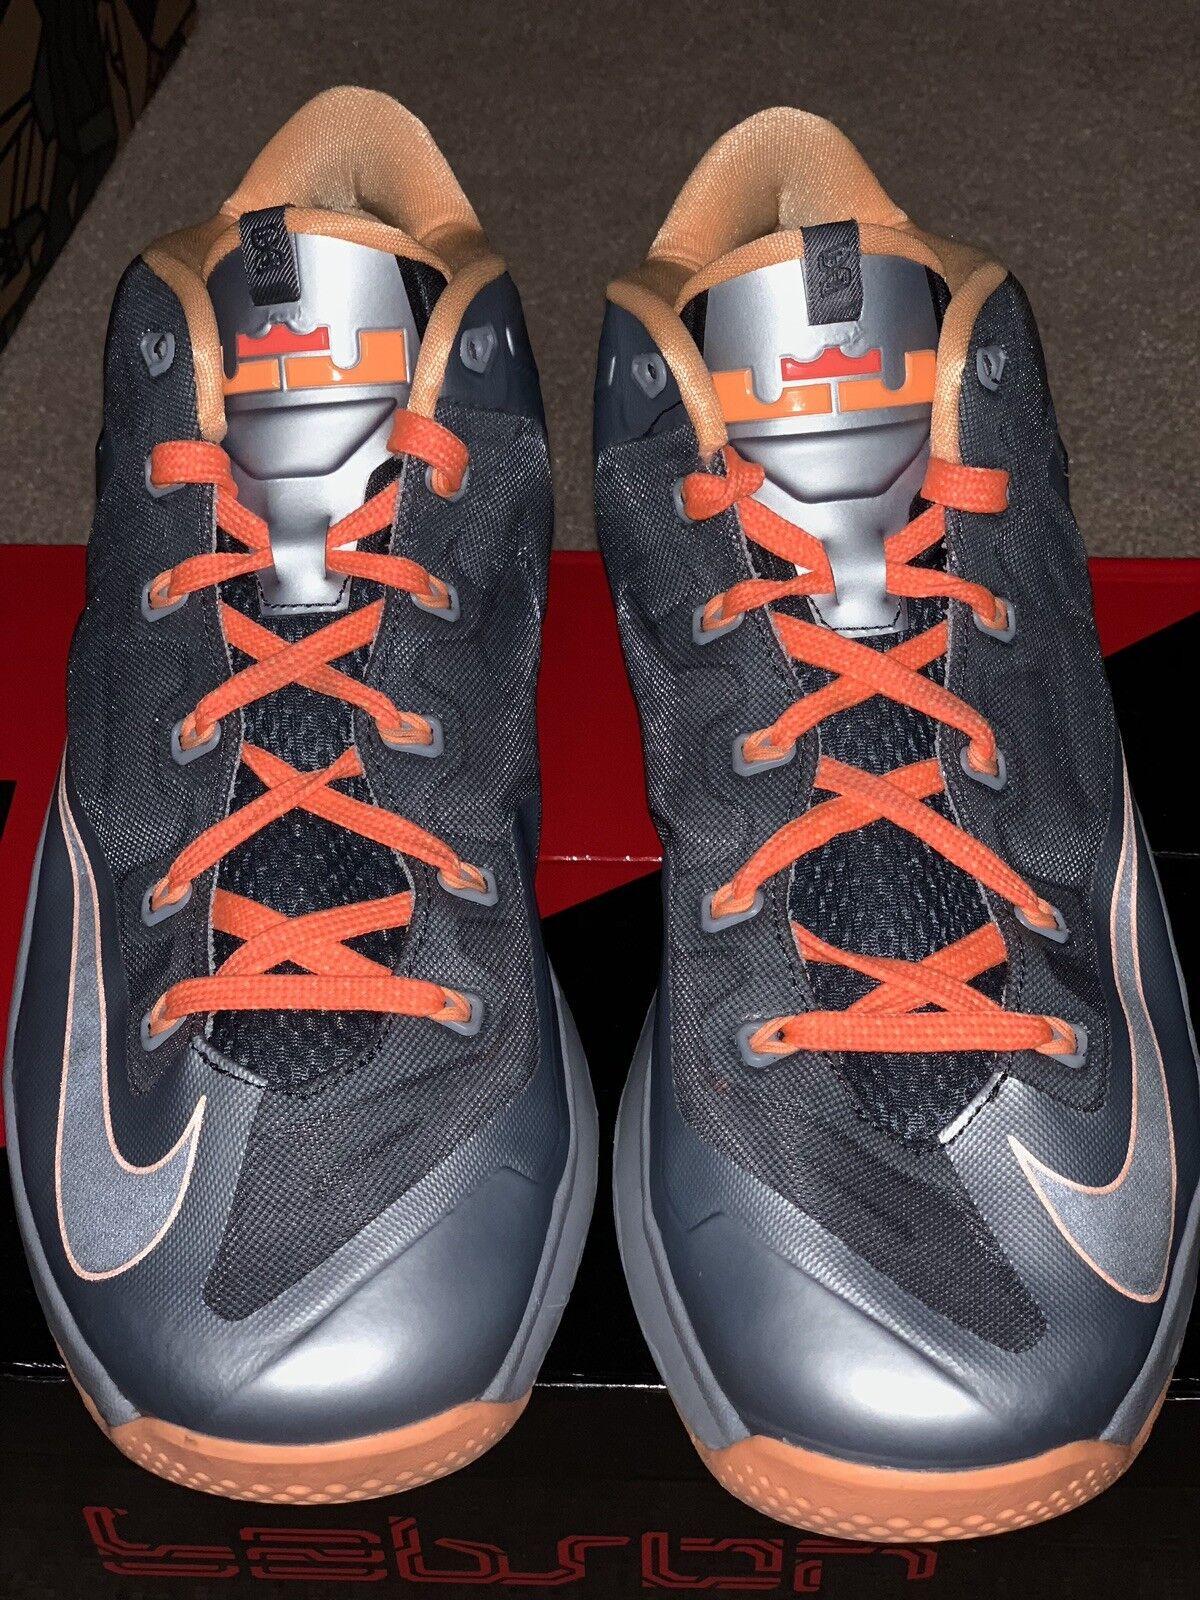 Nike Lebron Lebron Nike 11 Low Pre lava Uomo Size 11.5 Pre Low Owned af393e   3cbc2a